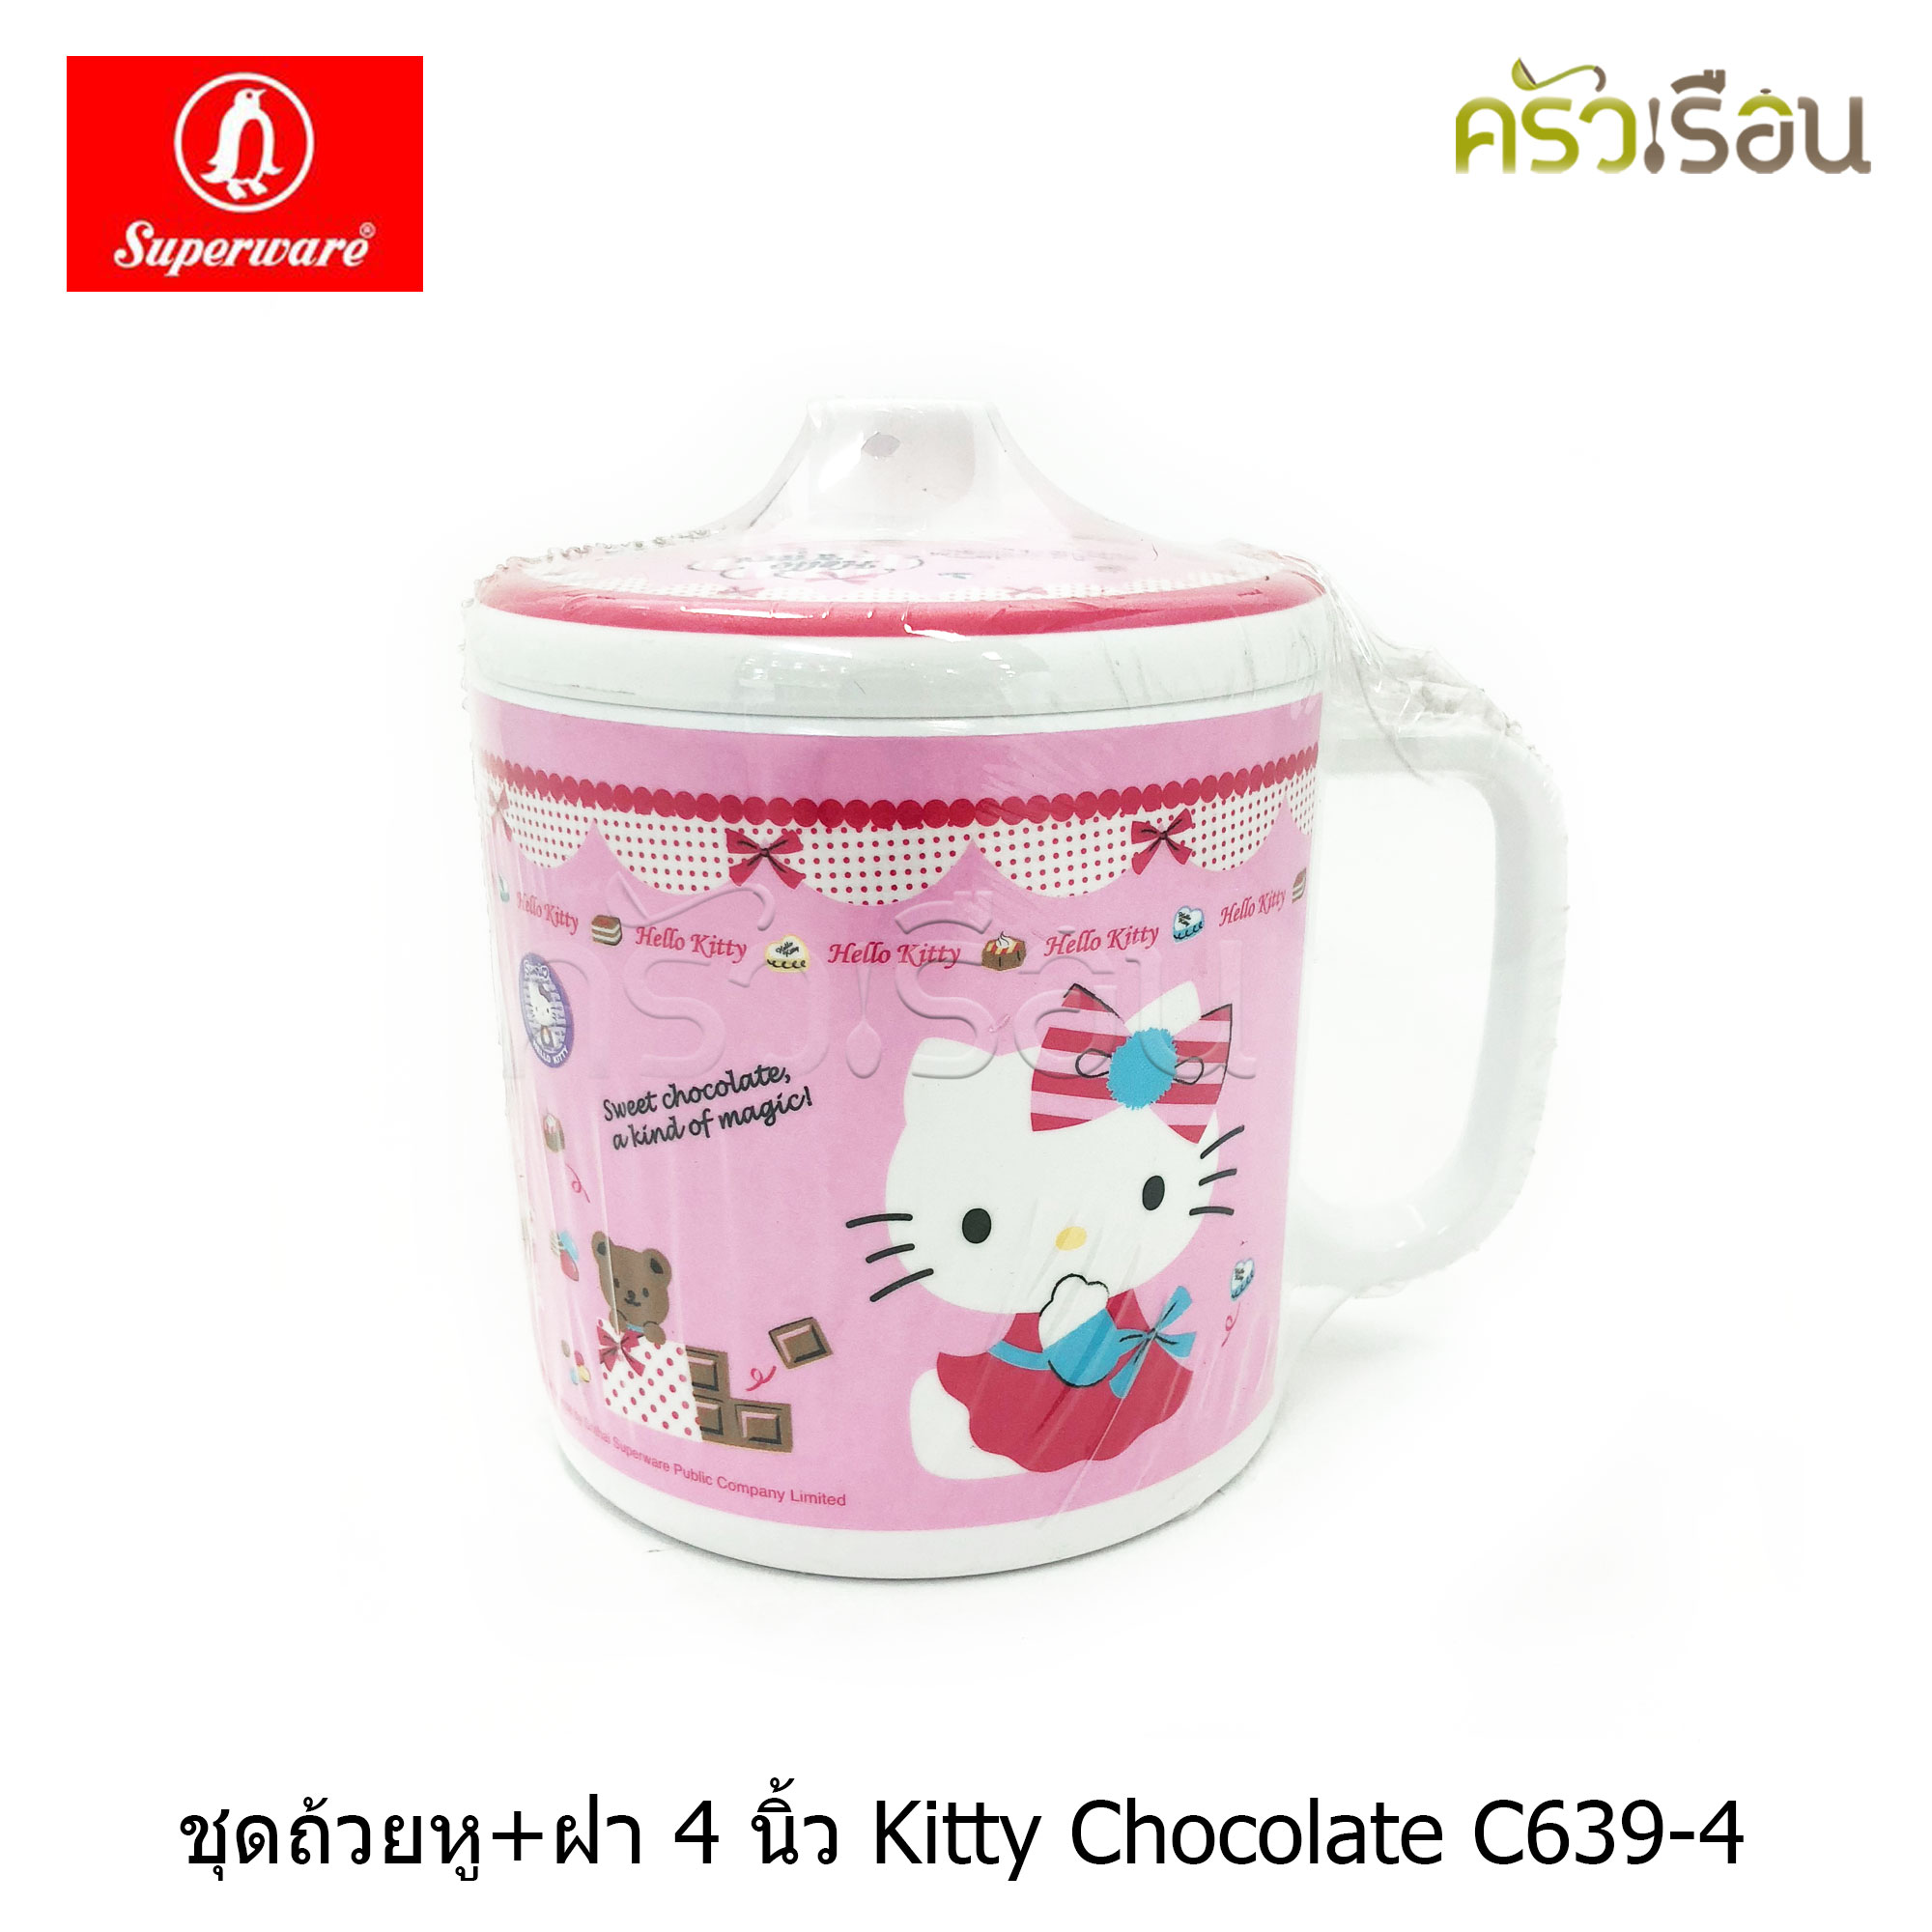 Superware ชุดถ้วยหู+ฝา Kitty Chocolate 4 นิ้ว CL639-4